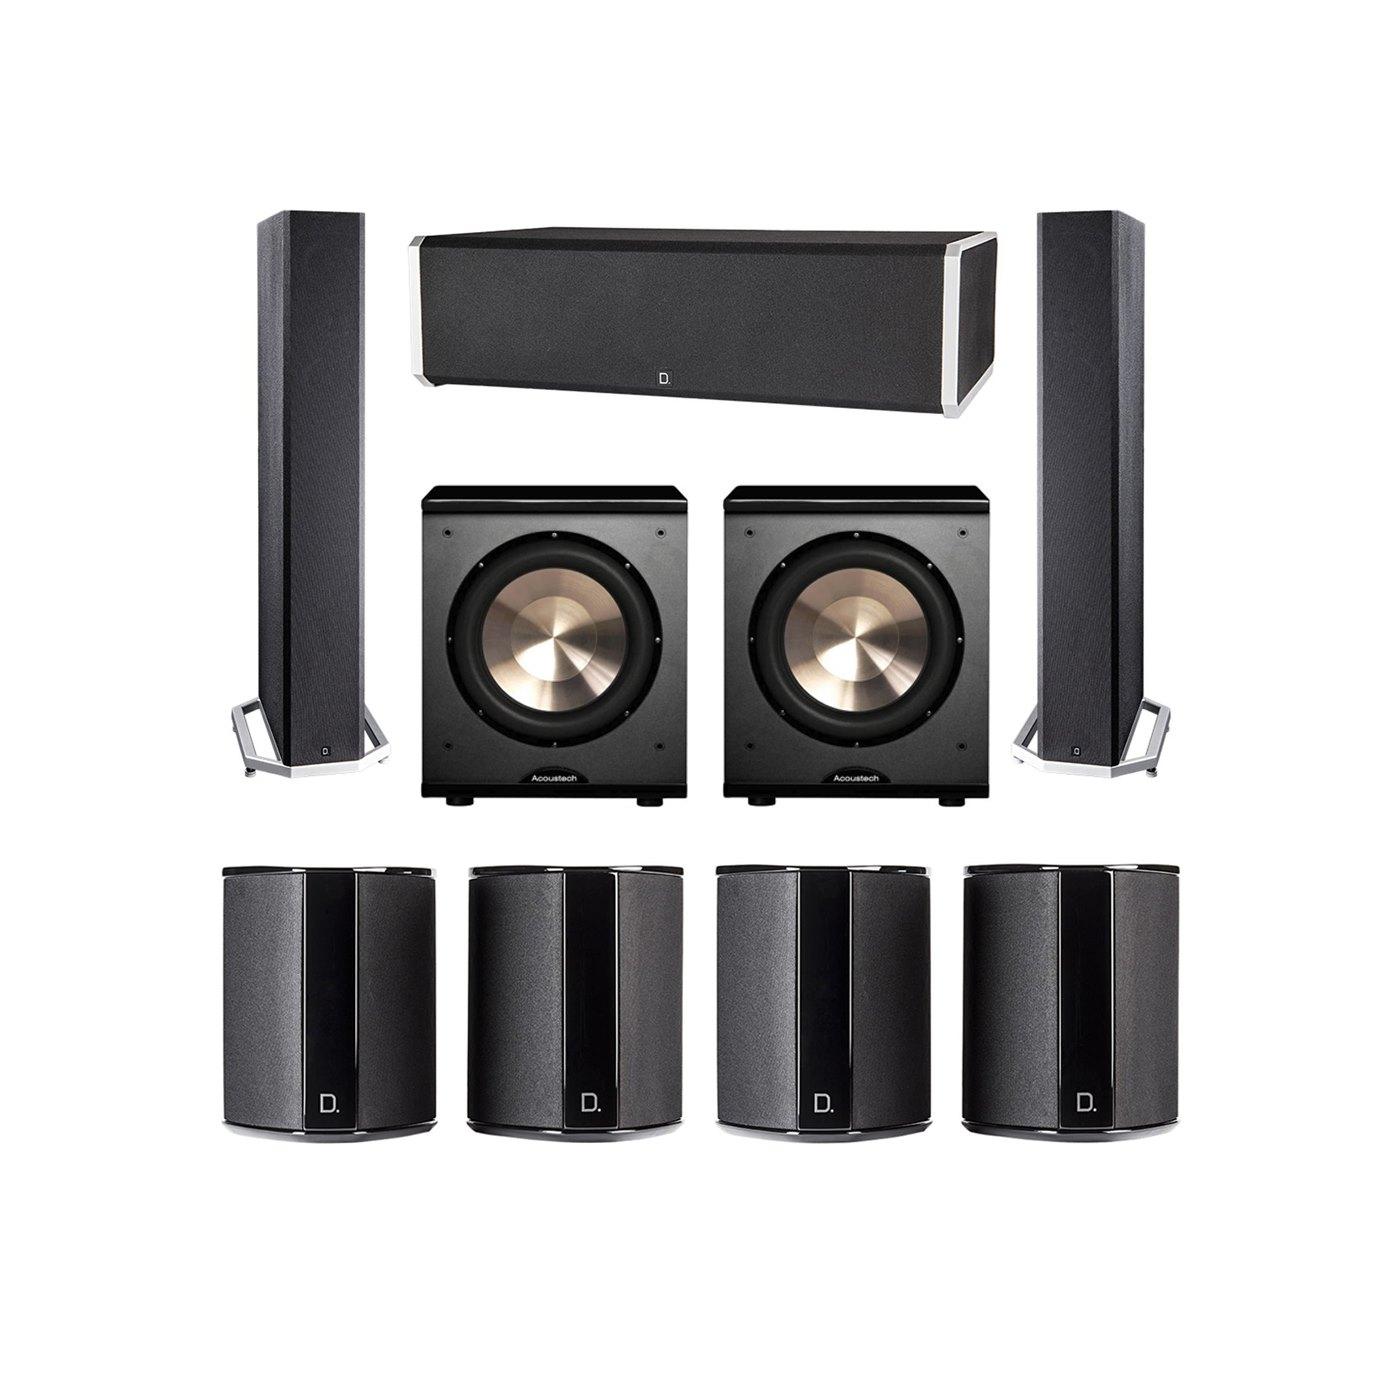 Definitive Technology 7.2 System with 2 BP9040 Tower Speakers, 1 CS9060 Center Channel Speaker, 4 SR9040 Surround Speaker, 2 BIC PL-200 Subwoofer